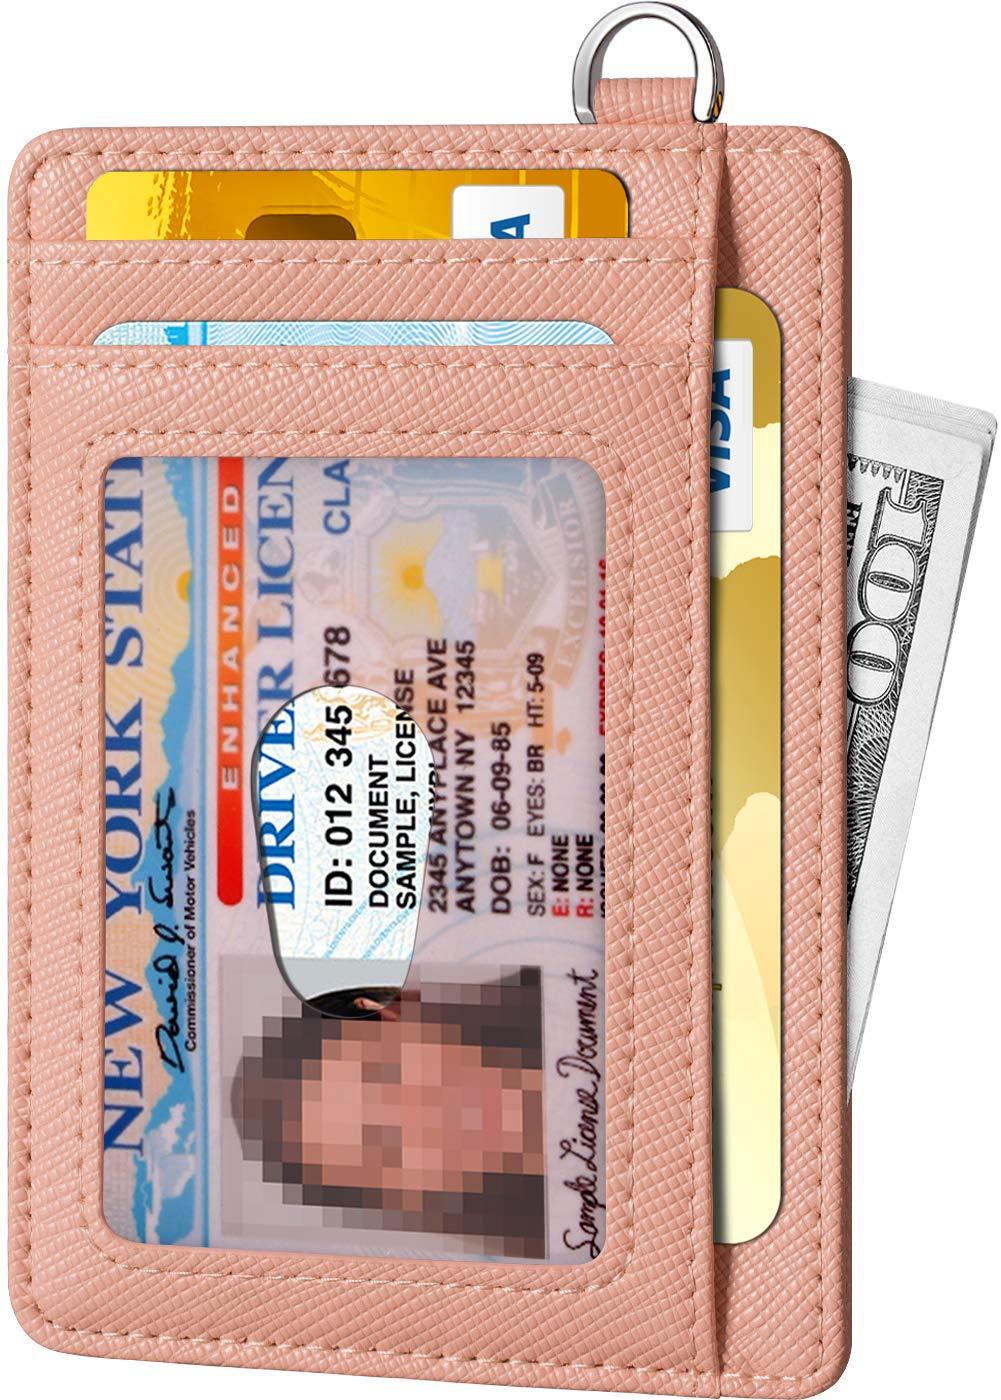 FurArt Slim Minimalist Wallet, Front Pocket Wallets, RFID Blocking, Credit Card Holder with Disassembly D-Shackle by FurArt (Image #2)